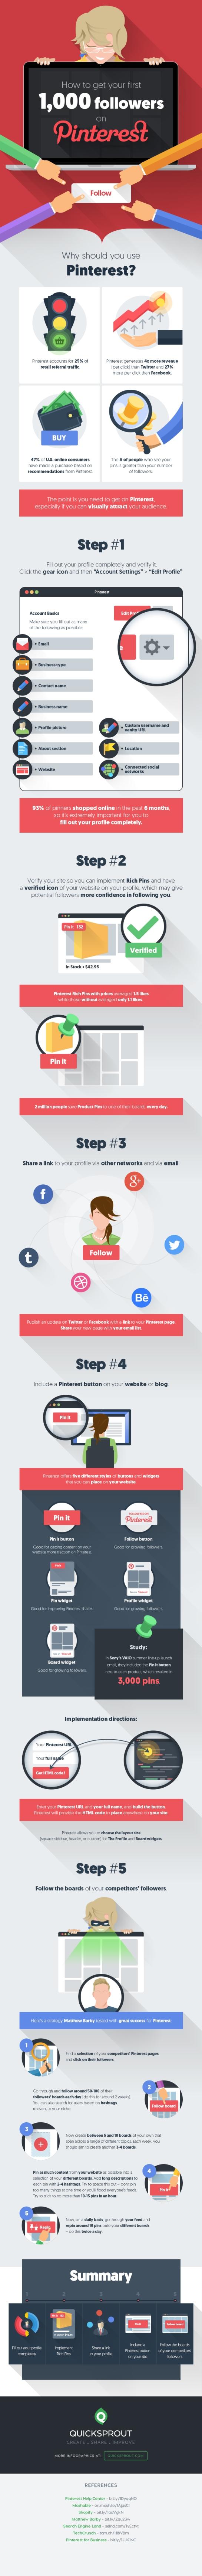 Obtenir 1000 abonnés Pinterest rapidement - AUTOVEILLE